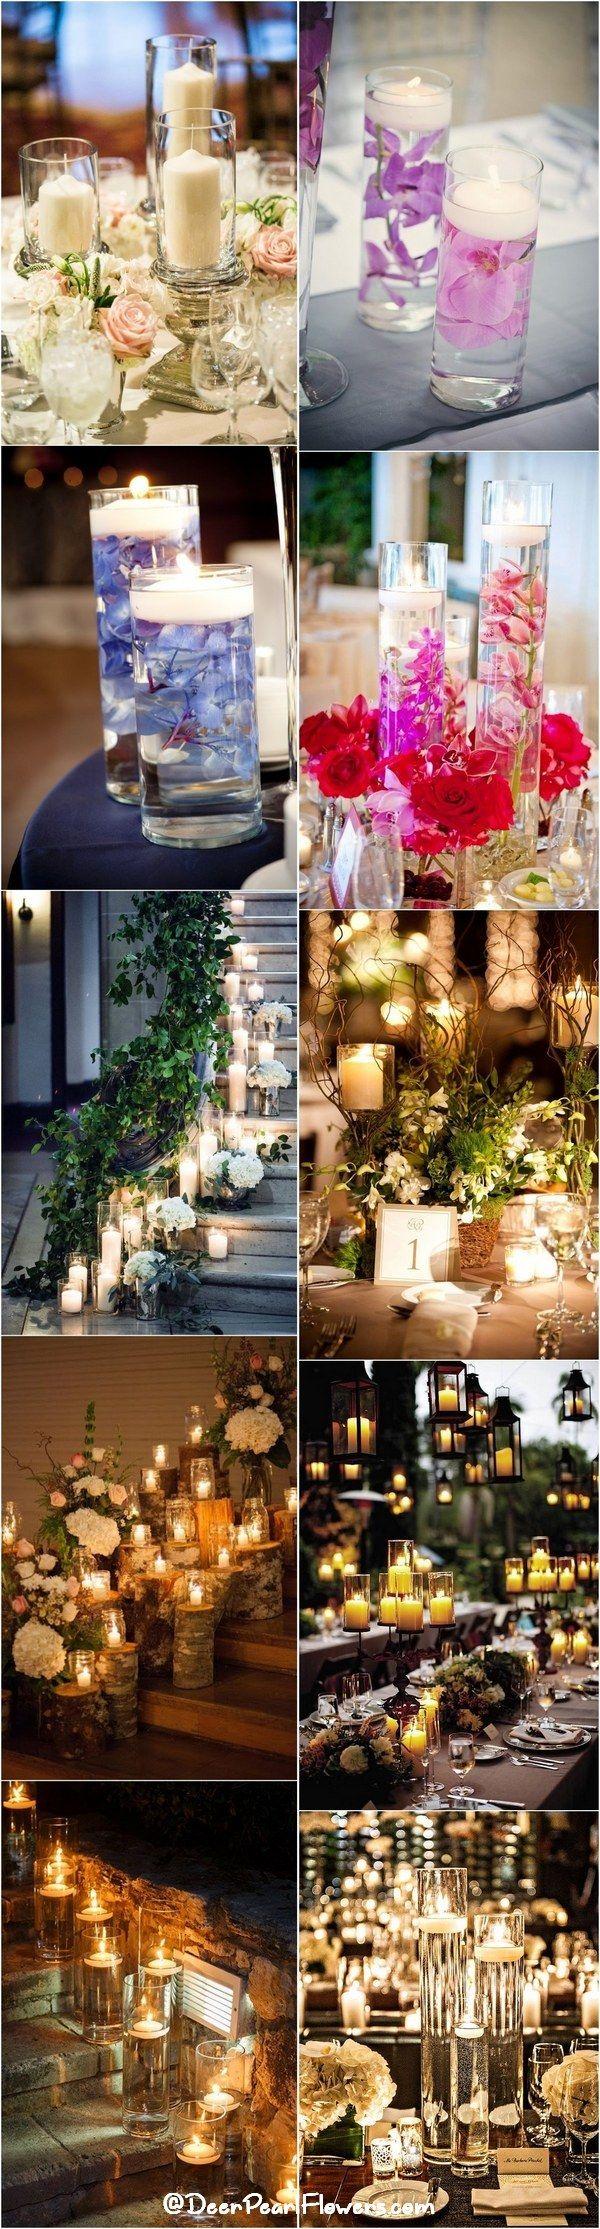 40 Chic Romantic Wedding Ideas Using Candles